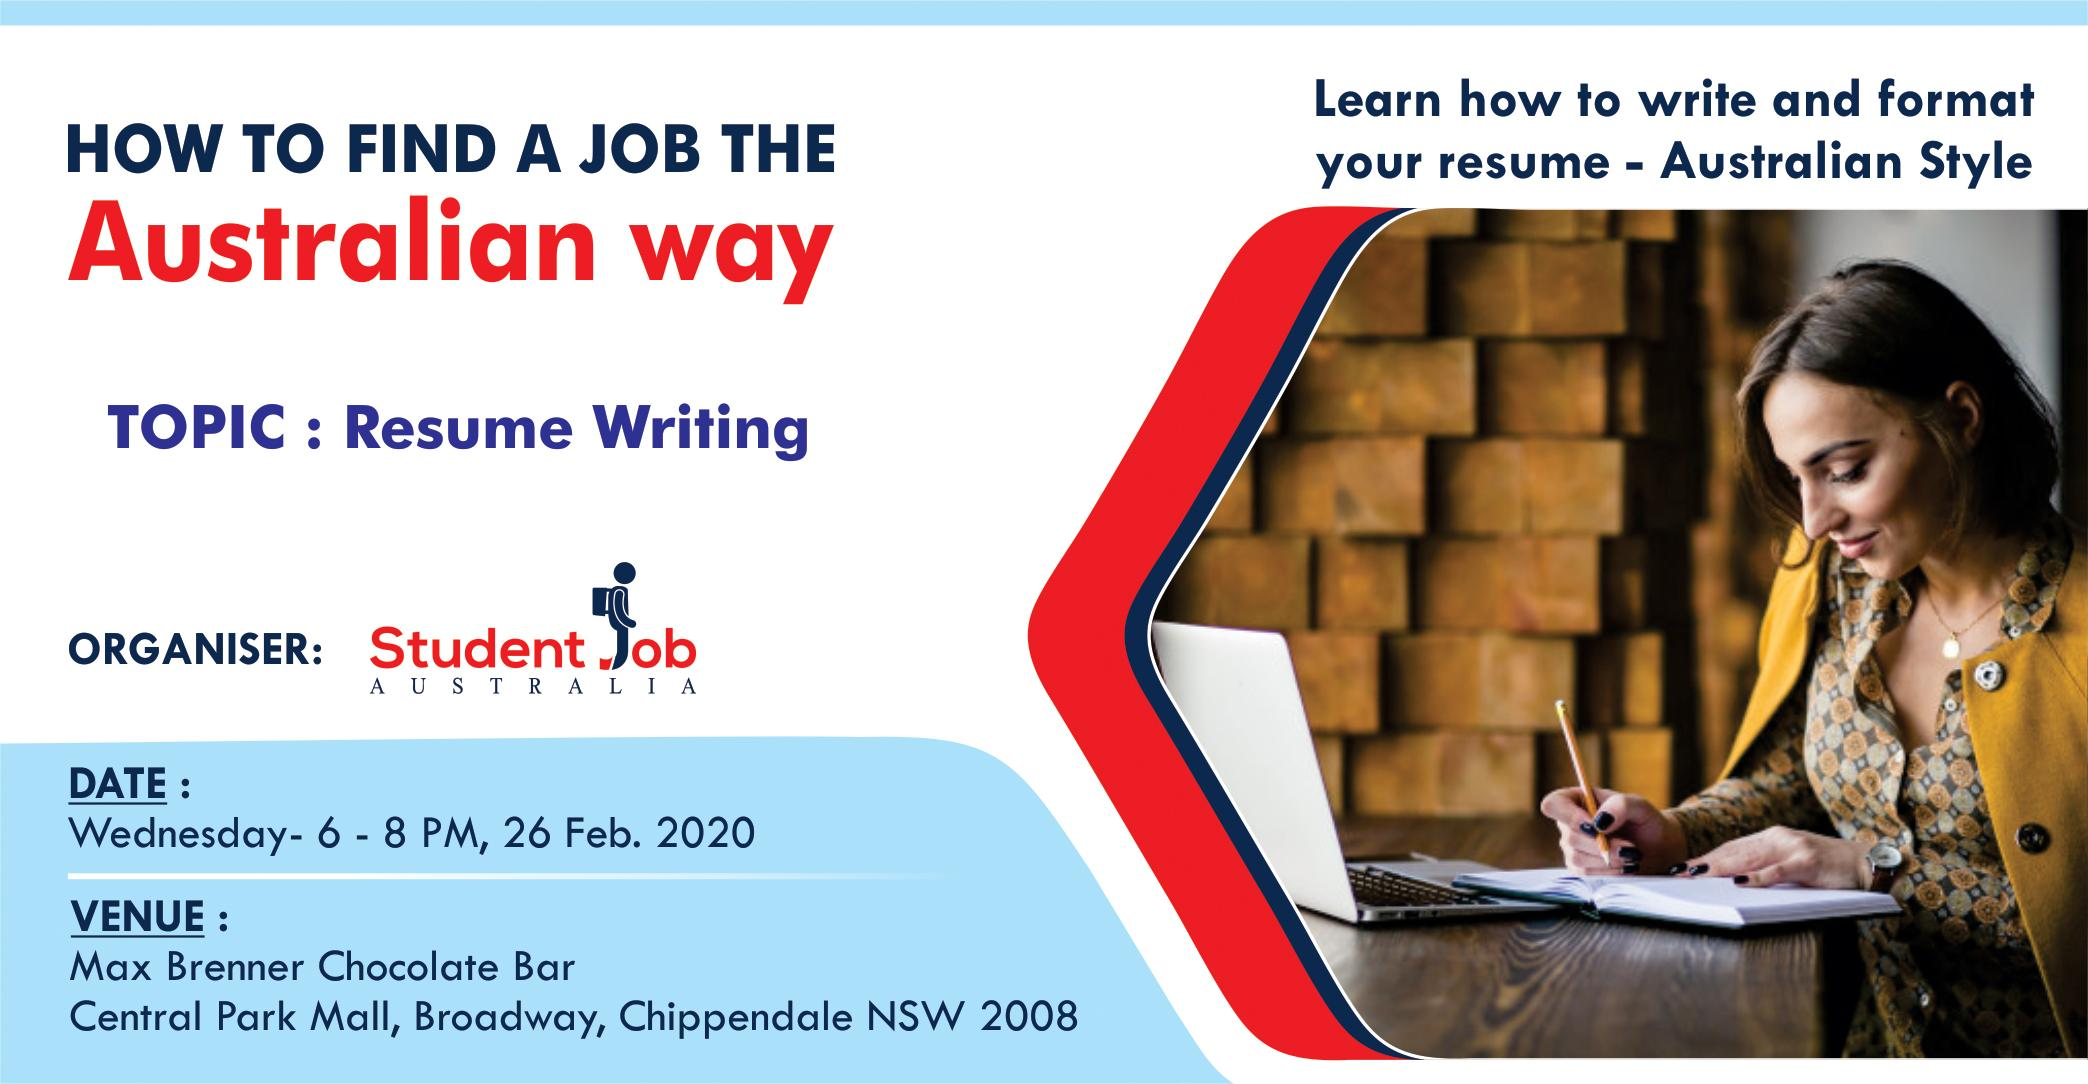 Find A Job The Australian Way 24 Feb 2020